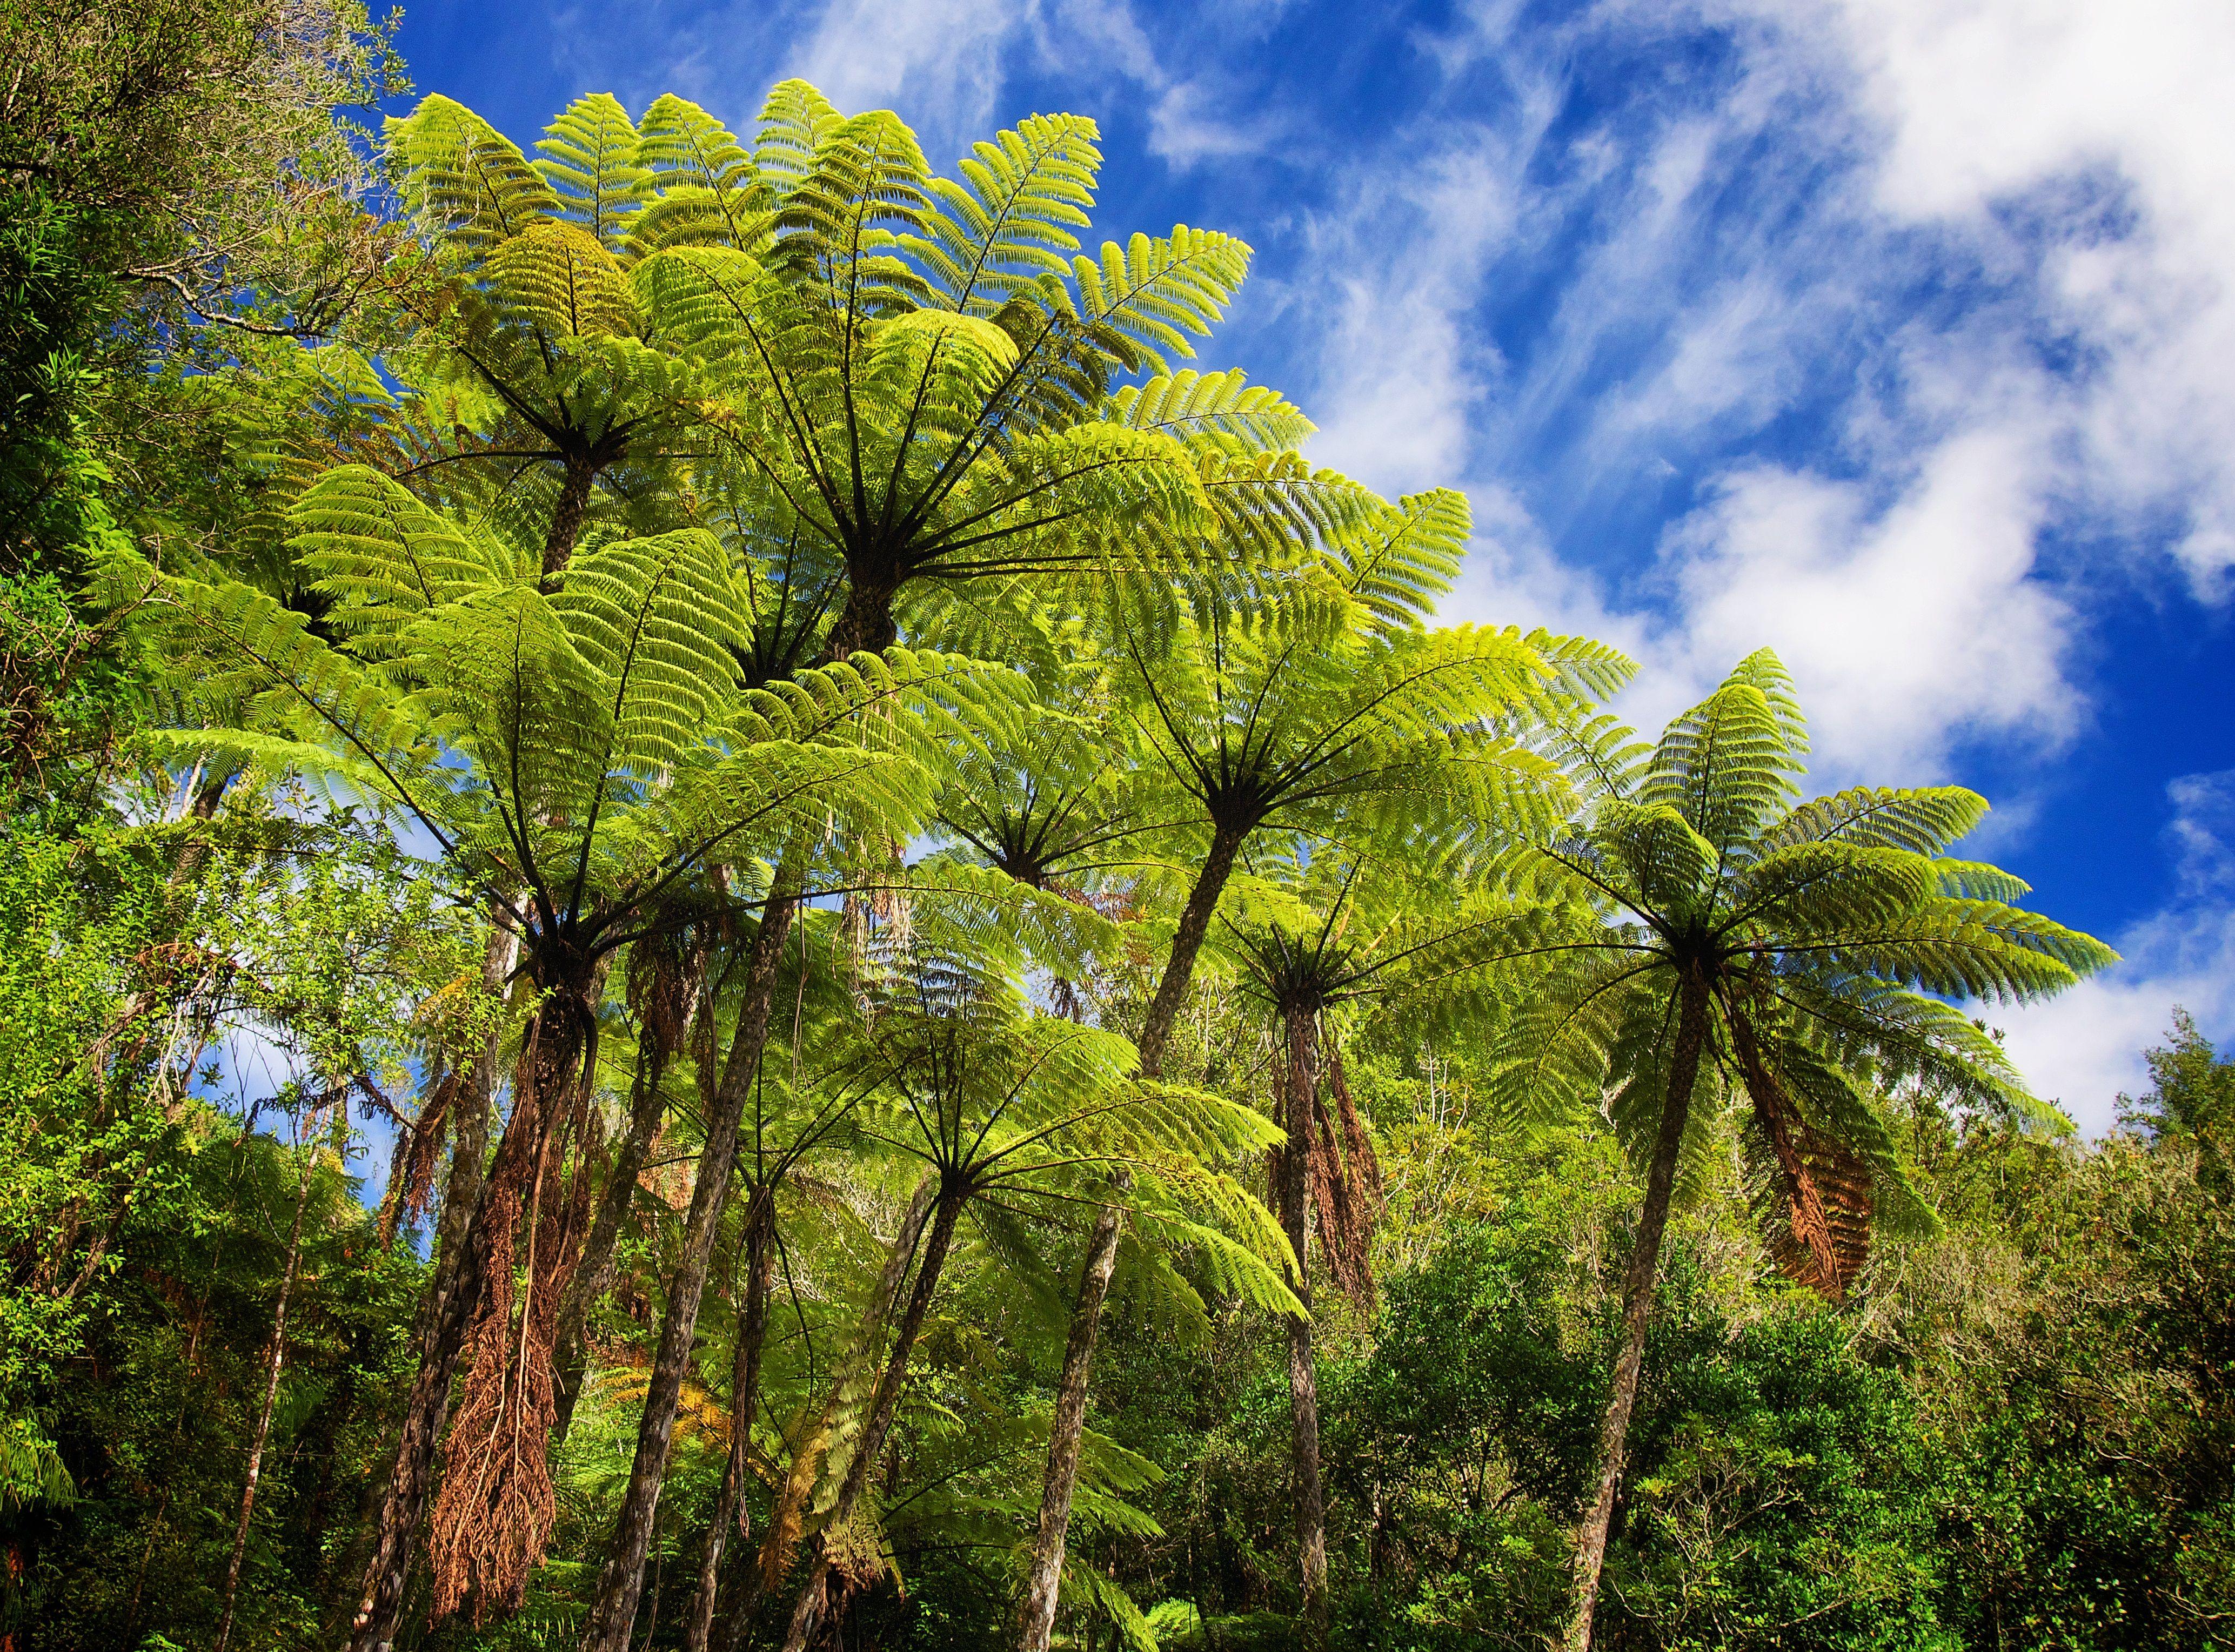 Black Tree Fern (Cyathea Medullaris), Also It Is Called Mamaku,